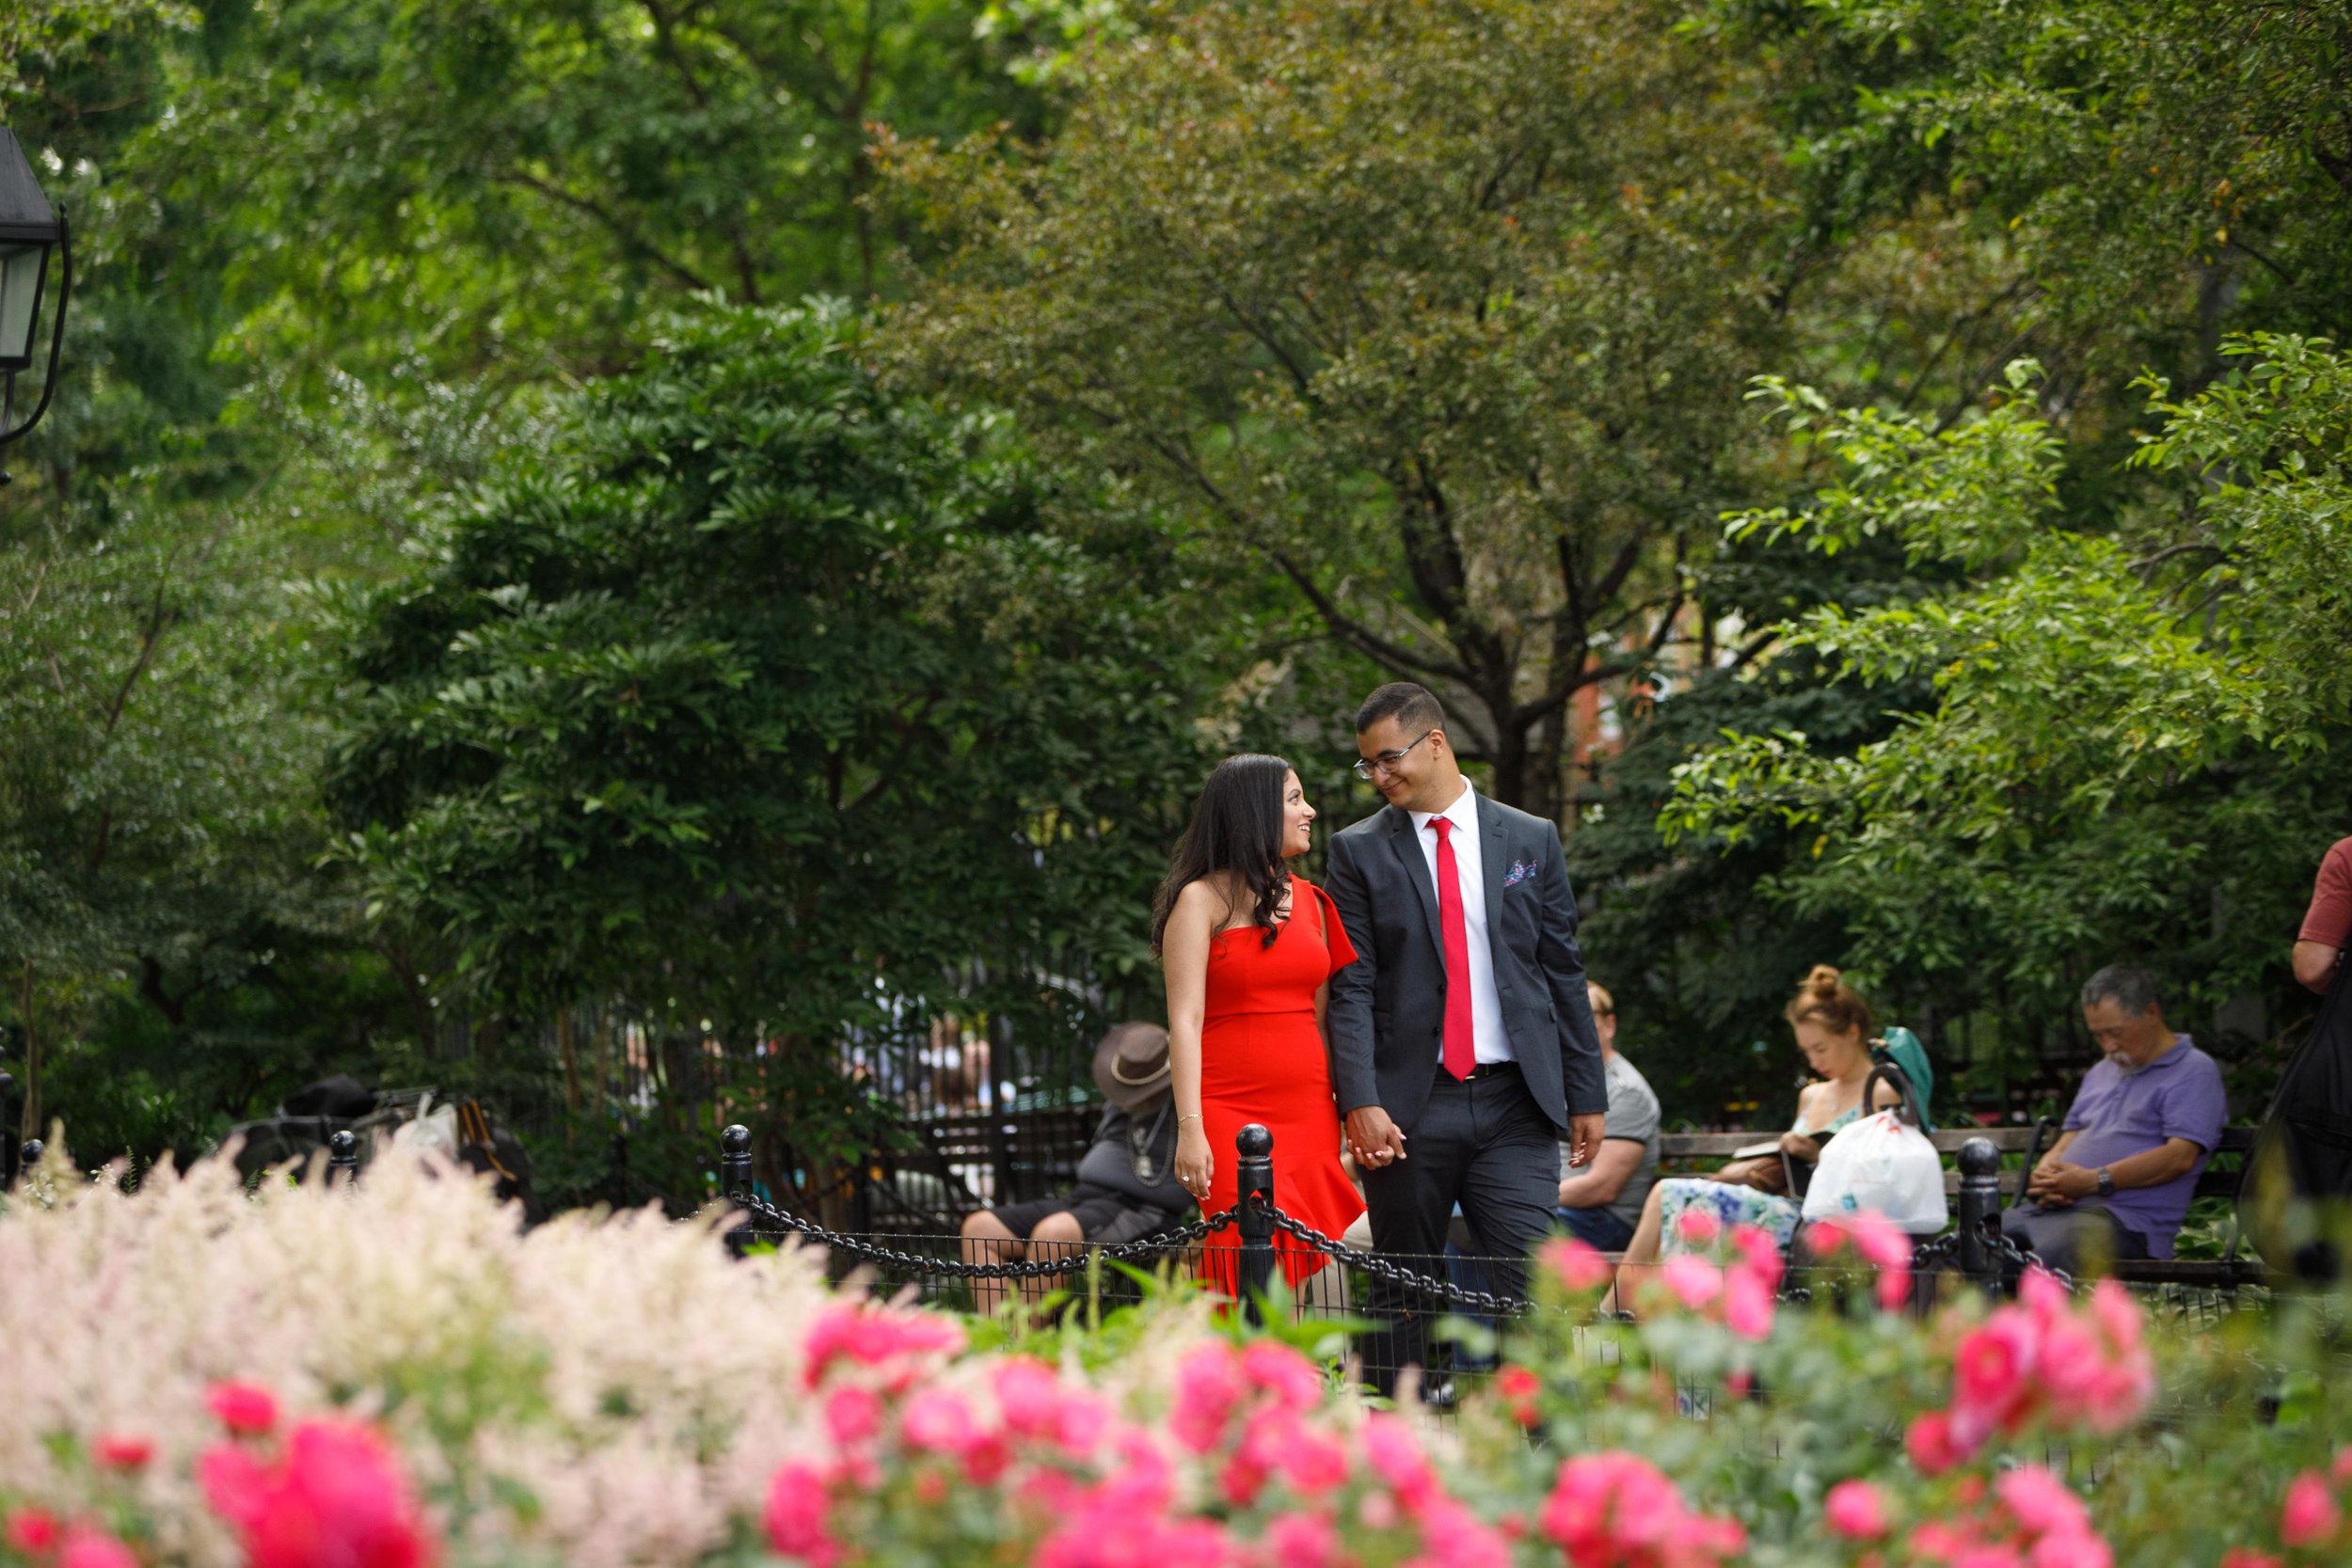 Kiro Rebecca Washington Square Park Marriage Proposal _ Jonathan Heisler _ 6152019 _039.jpg